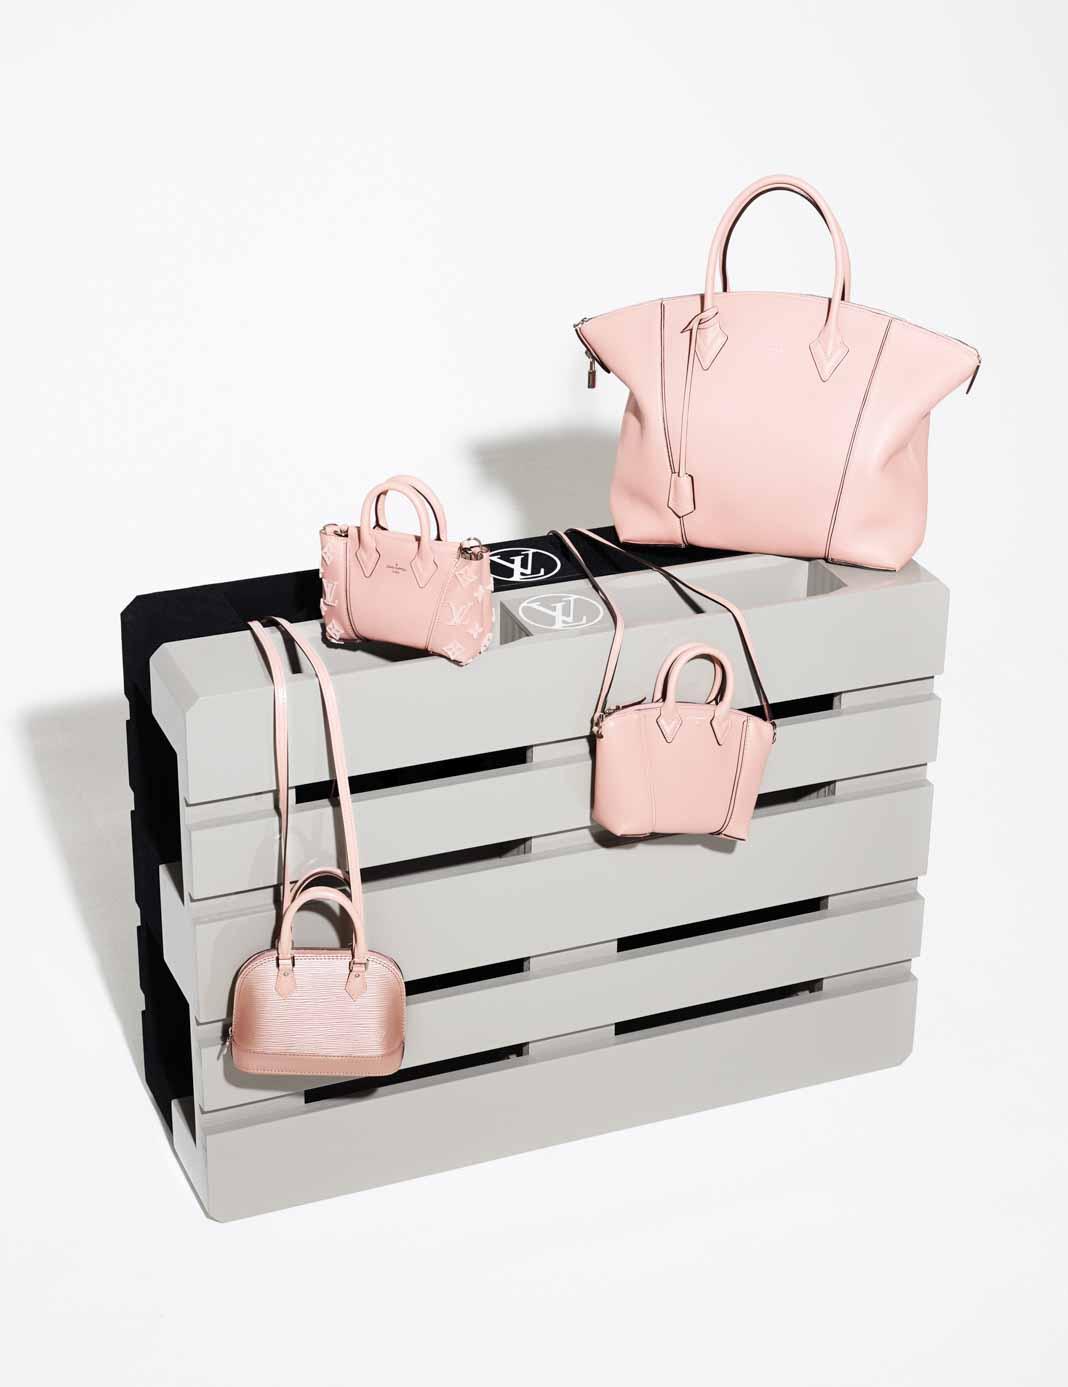 tui-nano-Louis-Vuitton-TT-619-2015-5